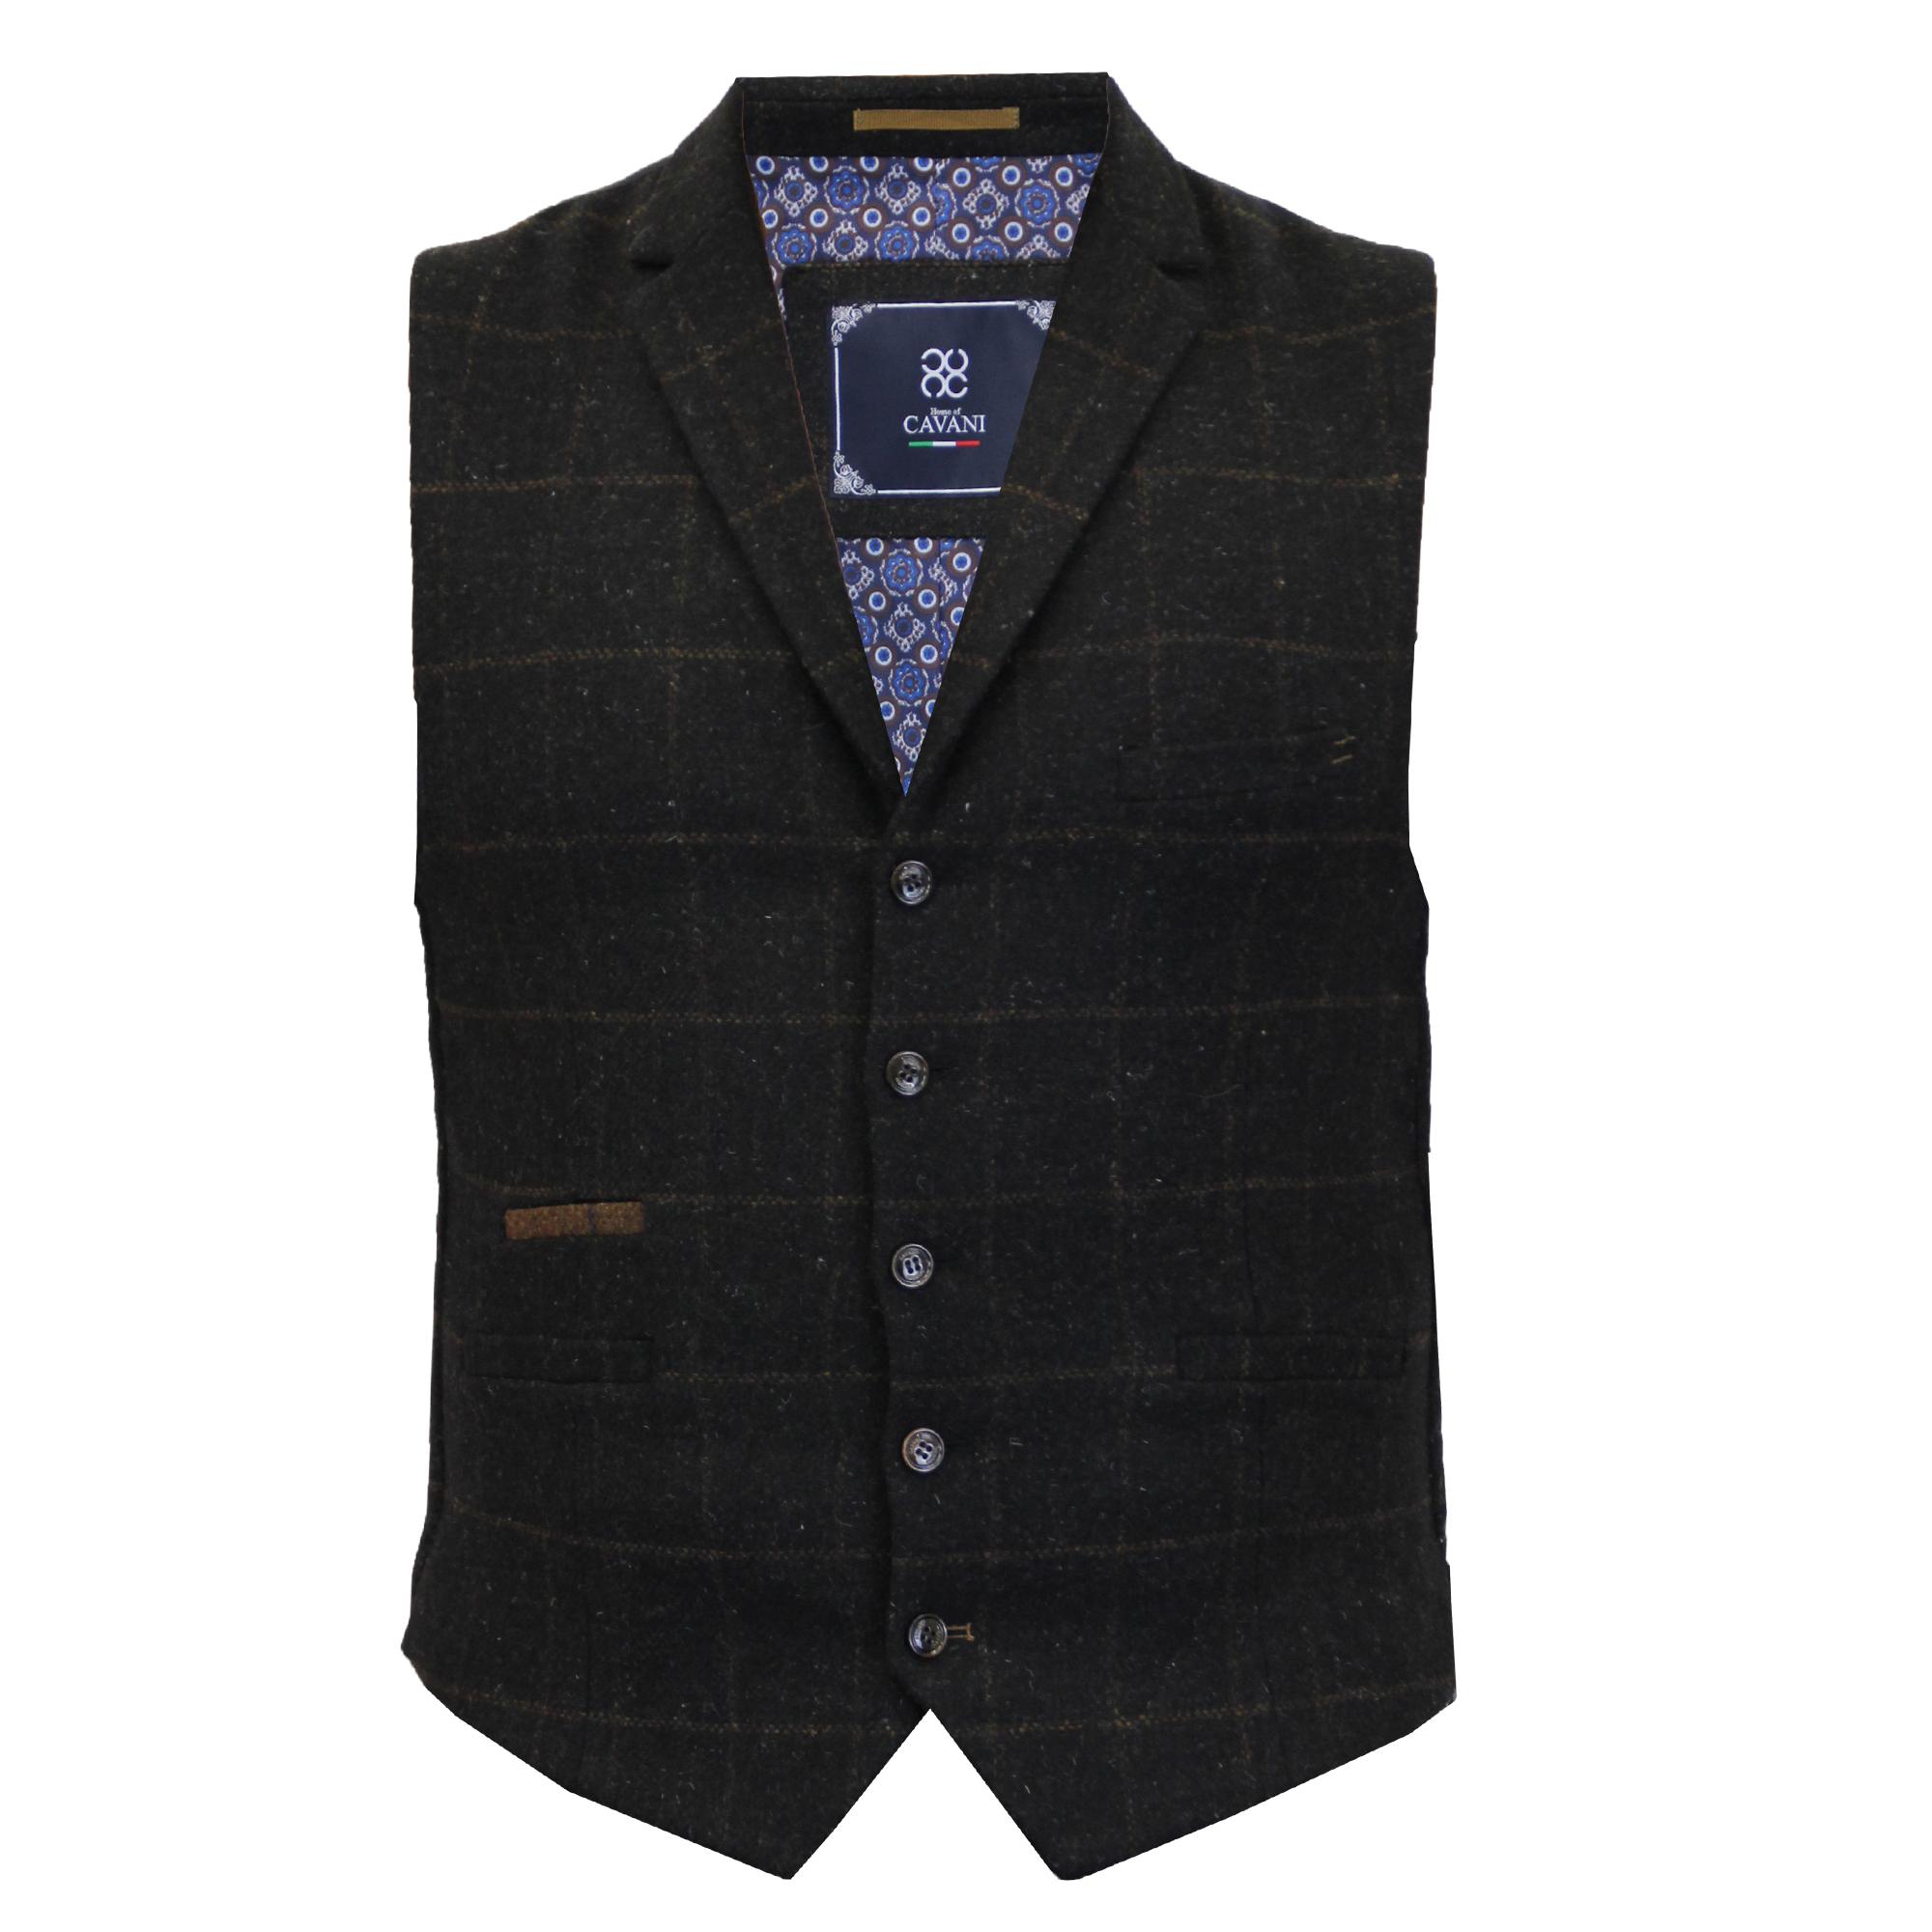 Mens-Waistcoat-Wool-Mix-Cord-Cavani-Formal-Vest-Herringbone-Tweed-Check-Party thumbnail 3